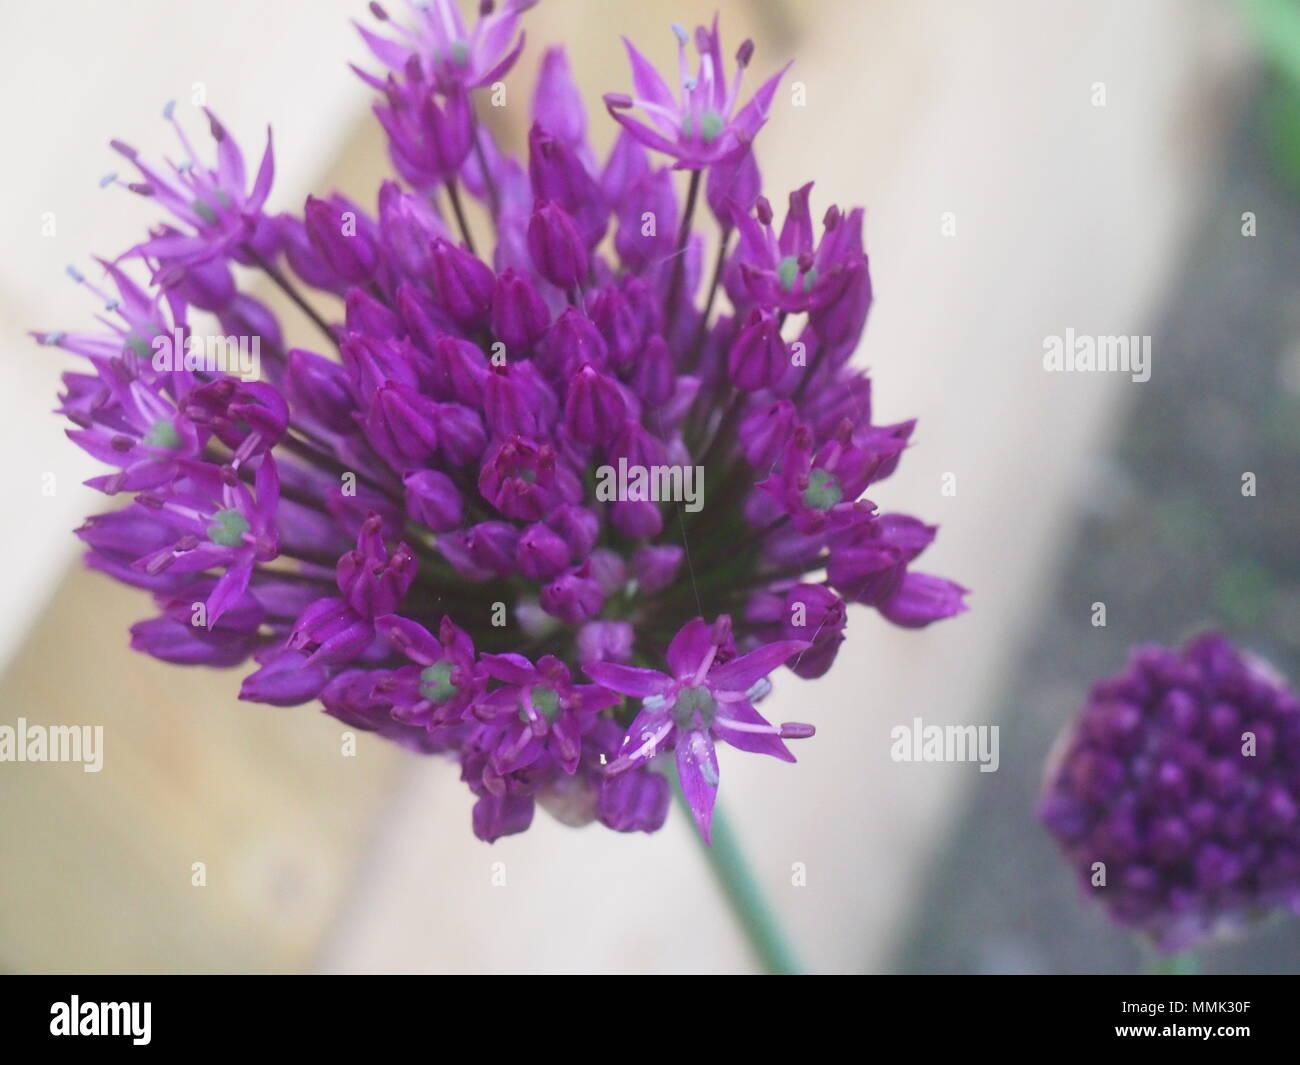 Purple Allium flowers partly open - Stock Image